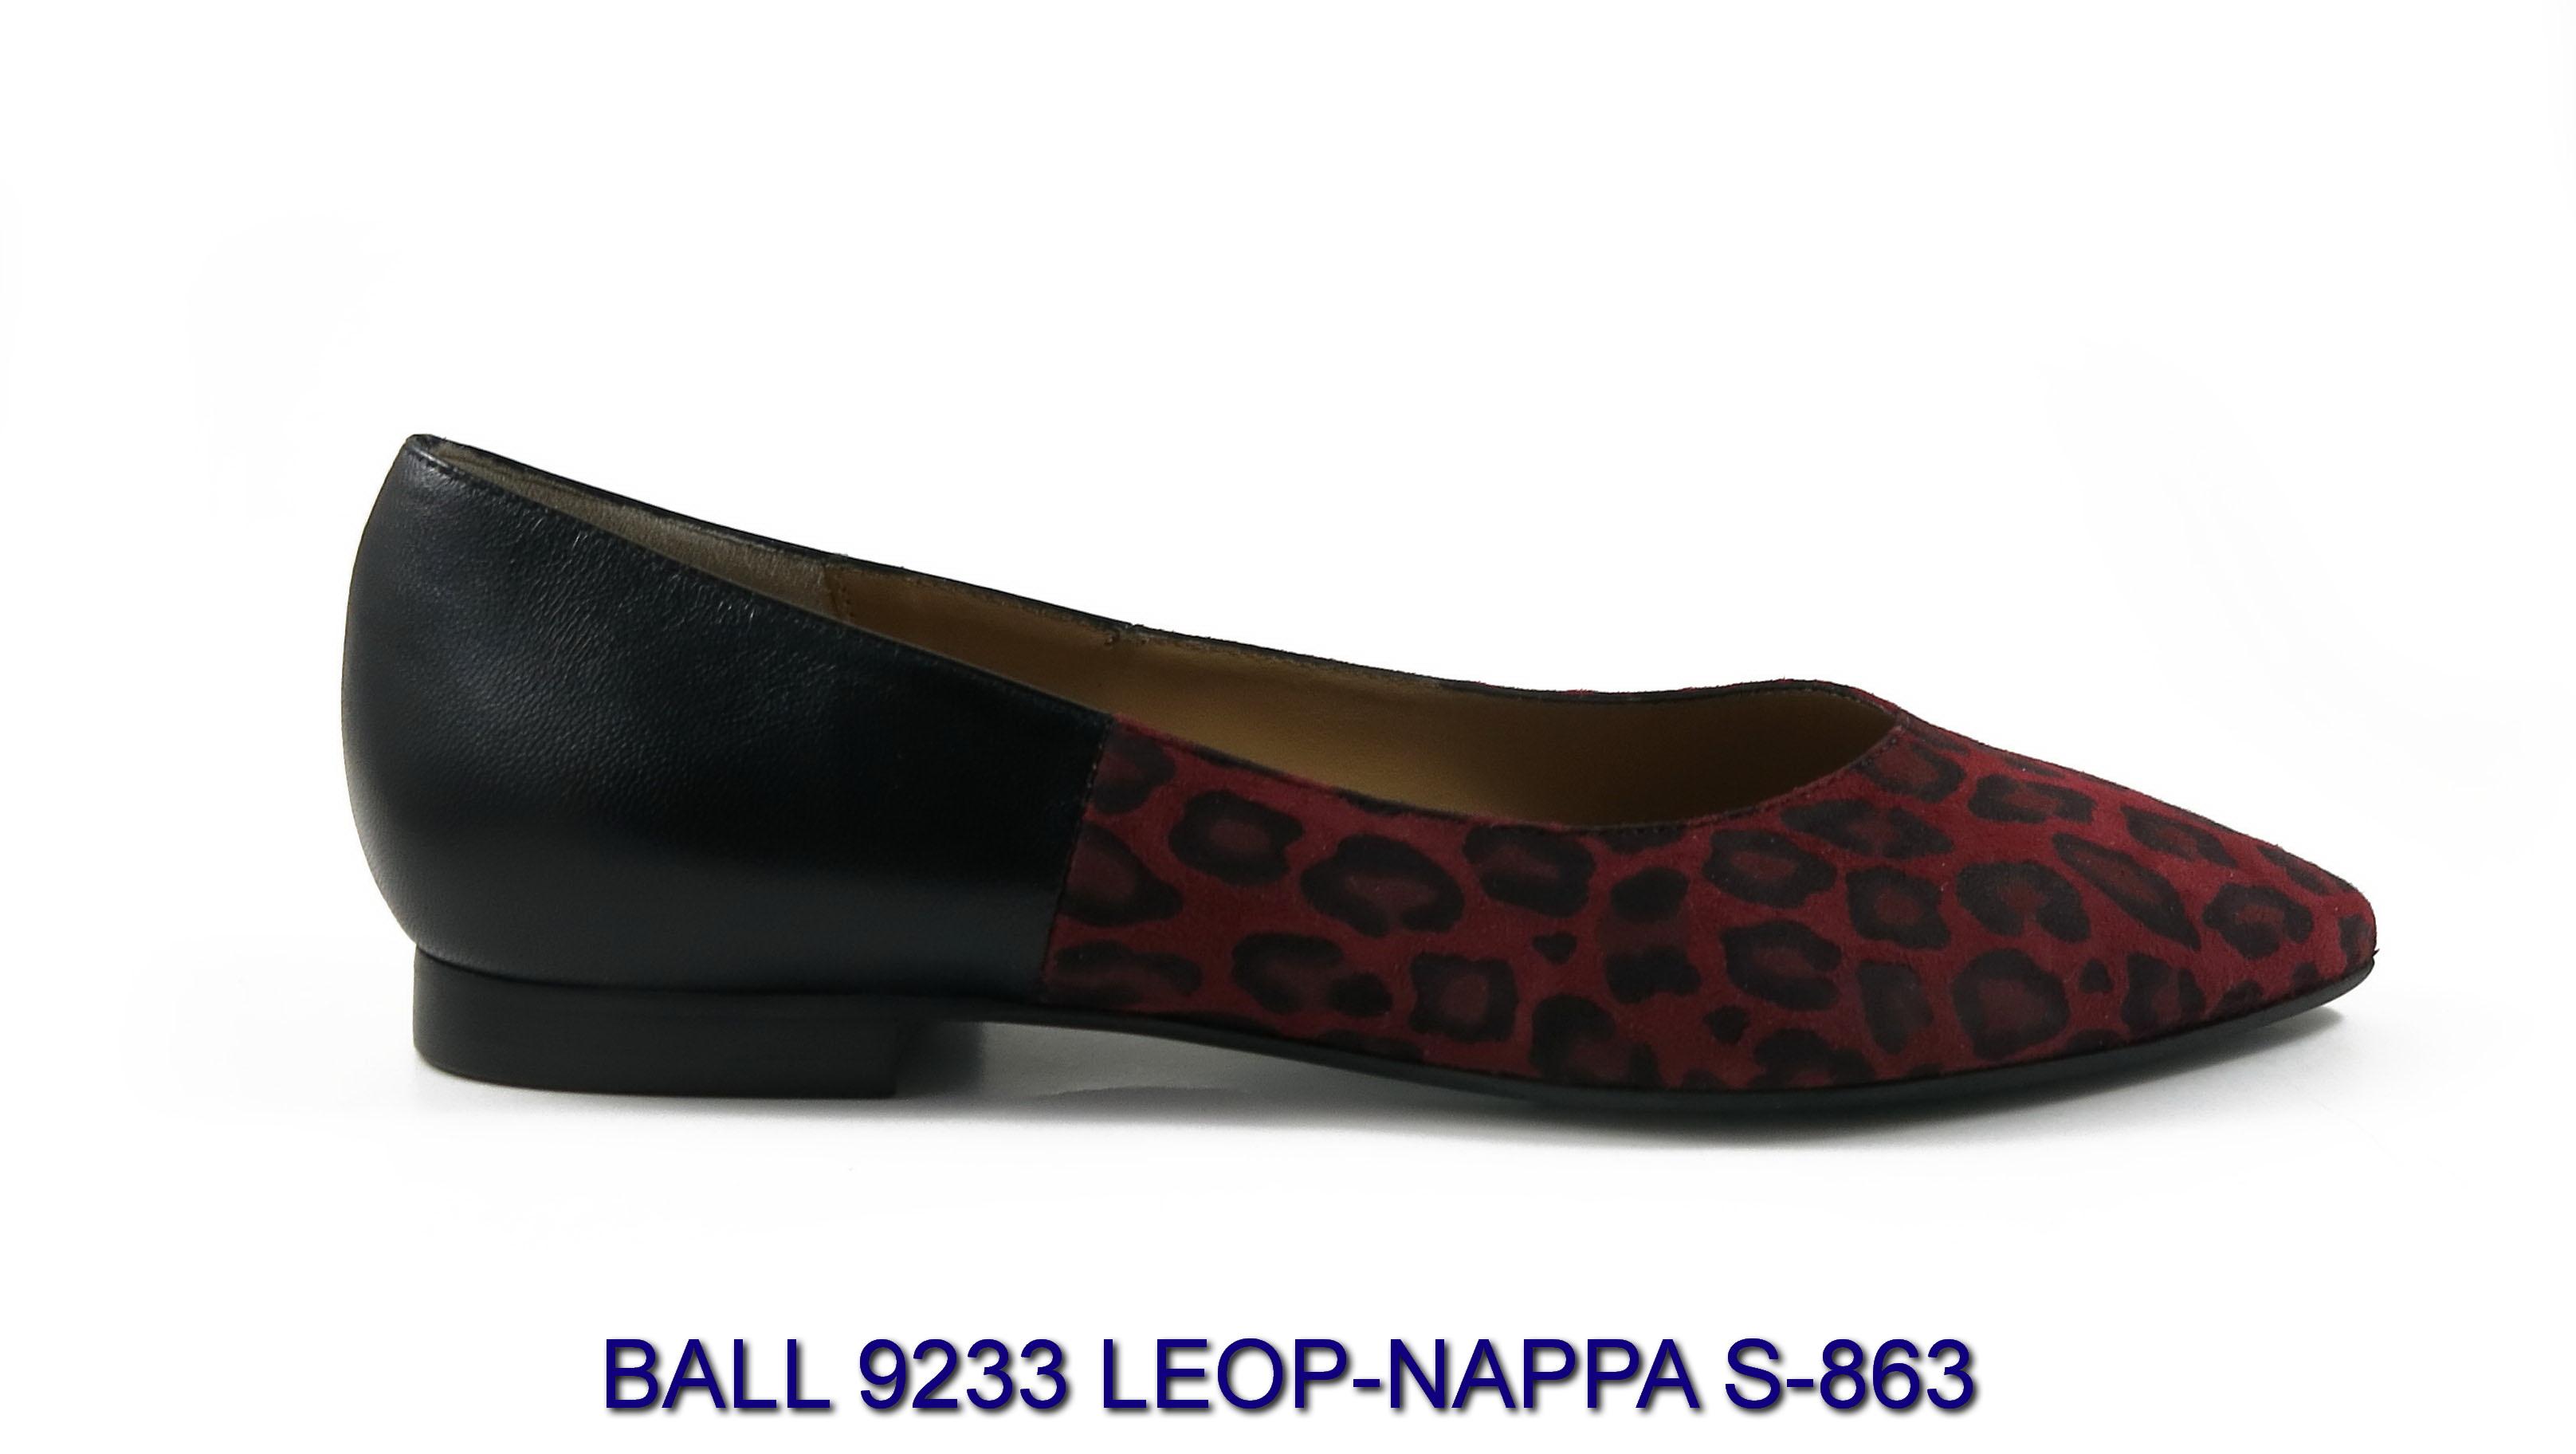 BALL-9233-LEOP-NAPPA-S-863